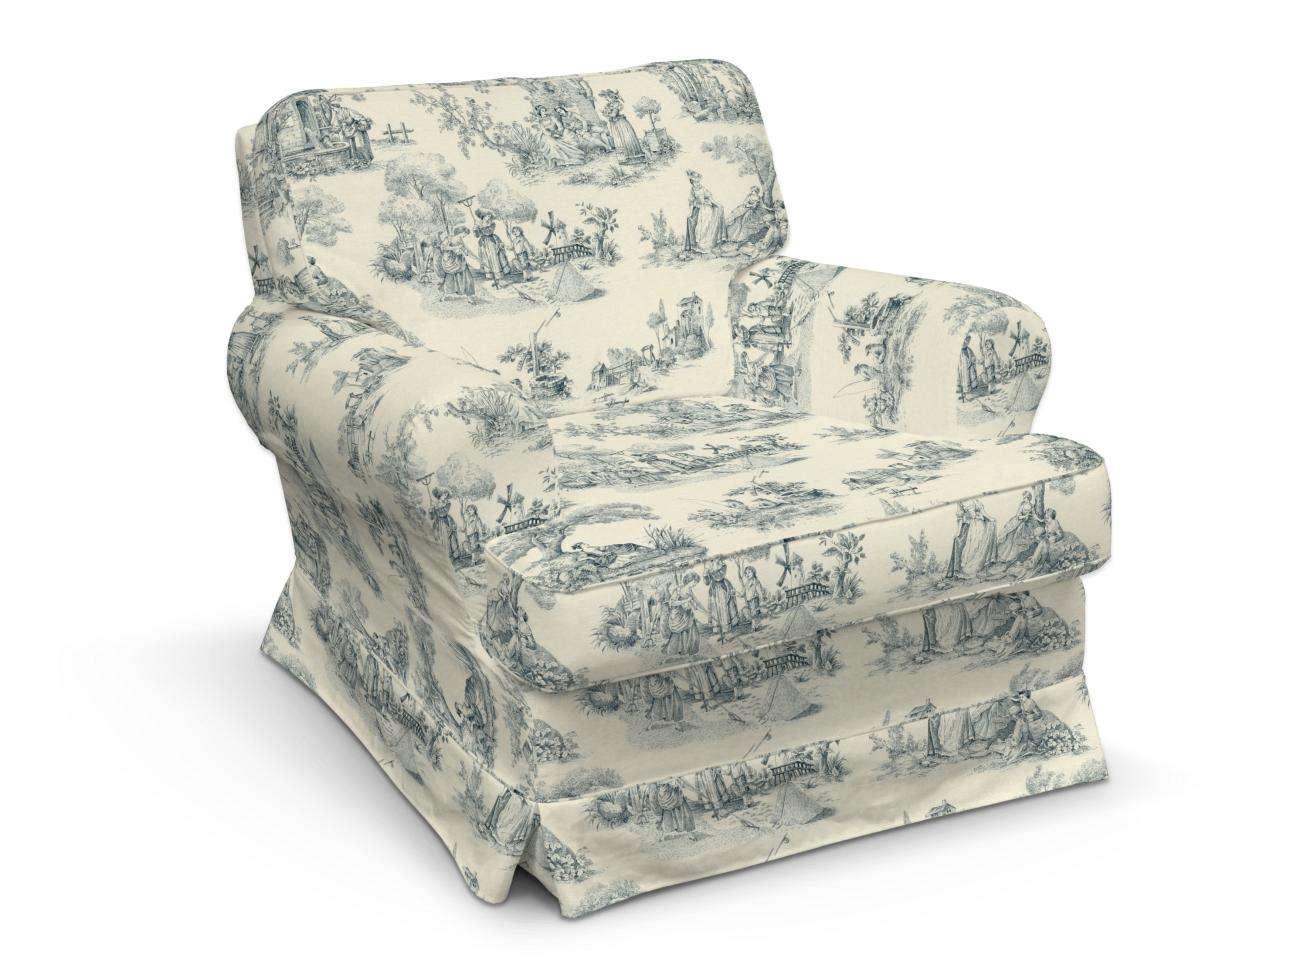 Potah na křeslo Barkaby fotel Barkaby v kolekci Avignon, látka: 132-66